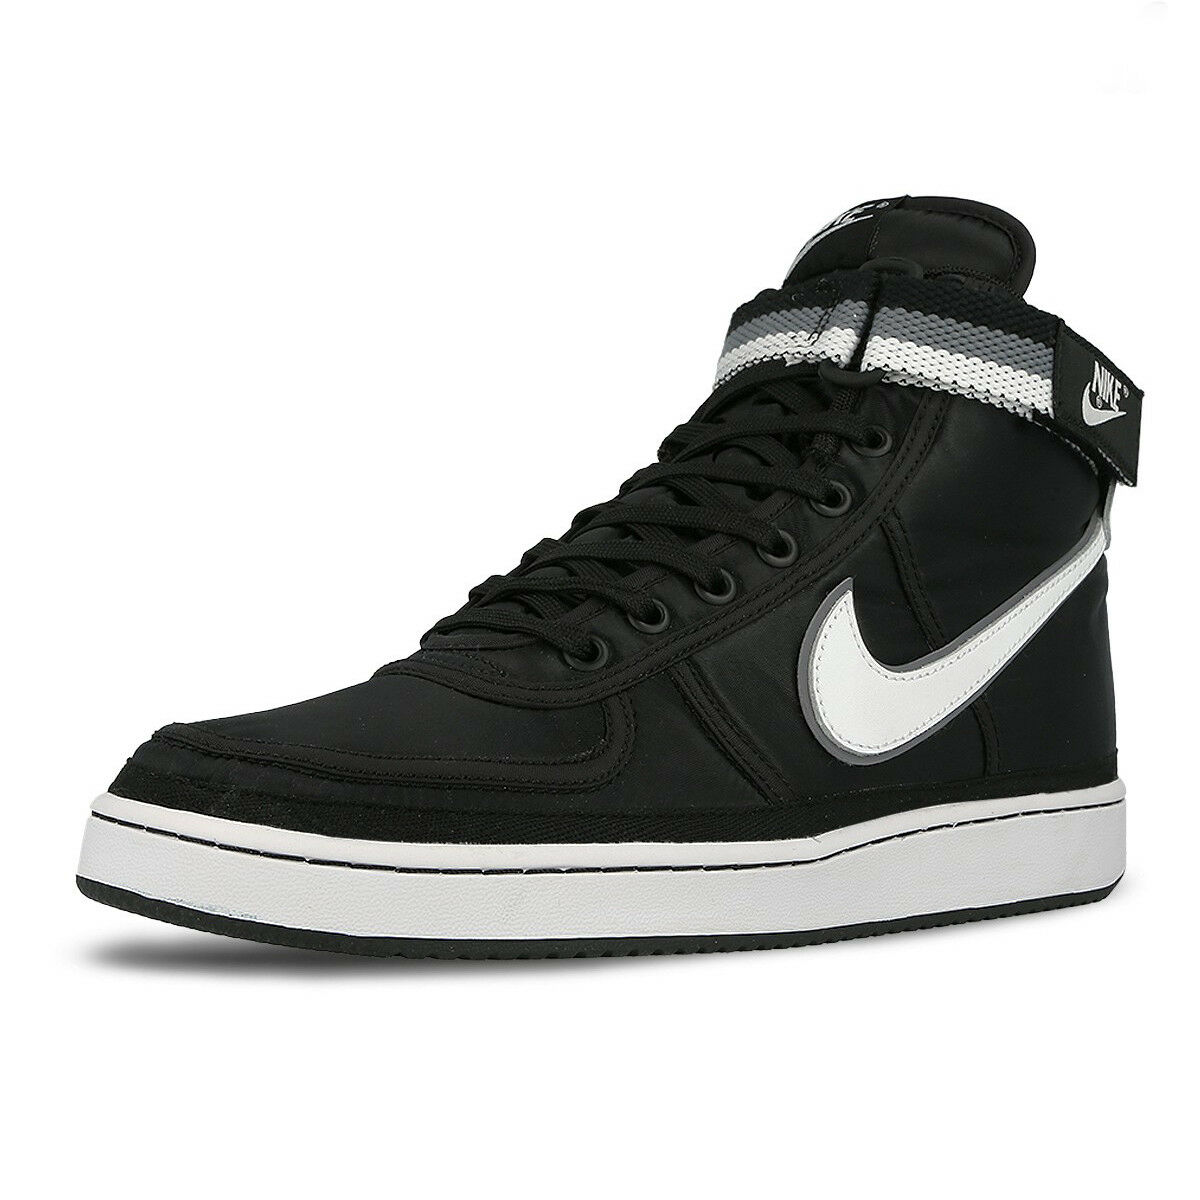 Nike Vandal High Supreme Black White Cool Grey Classic shoes Sneakers 318330-001